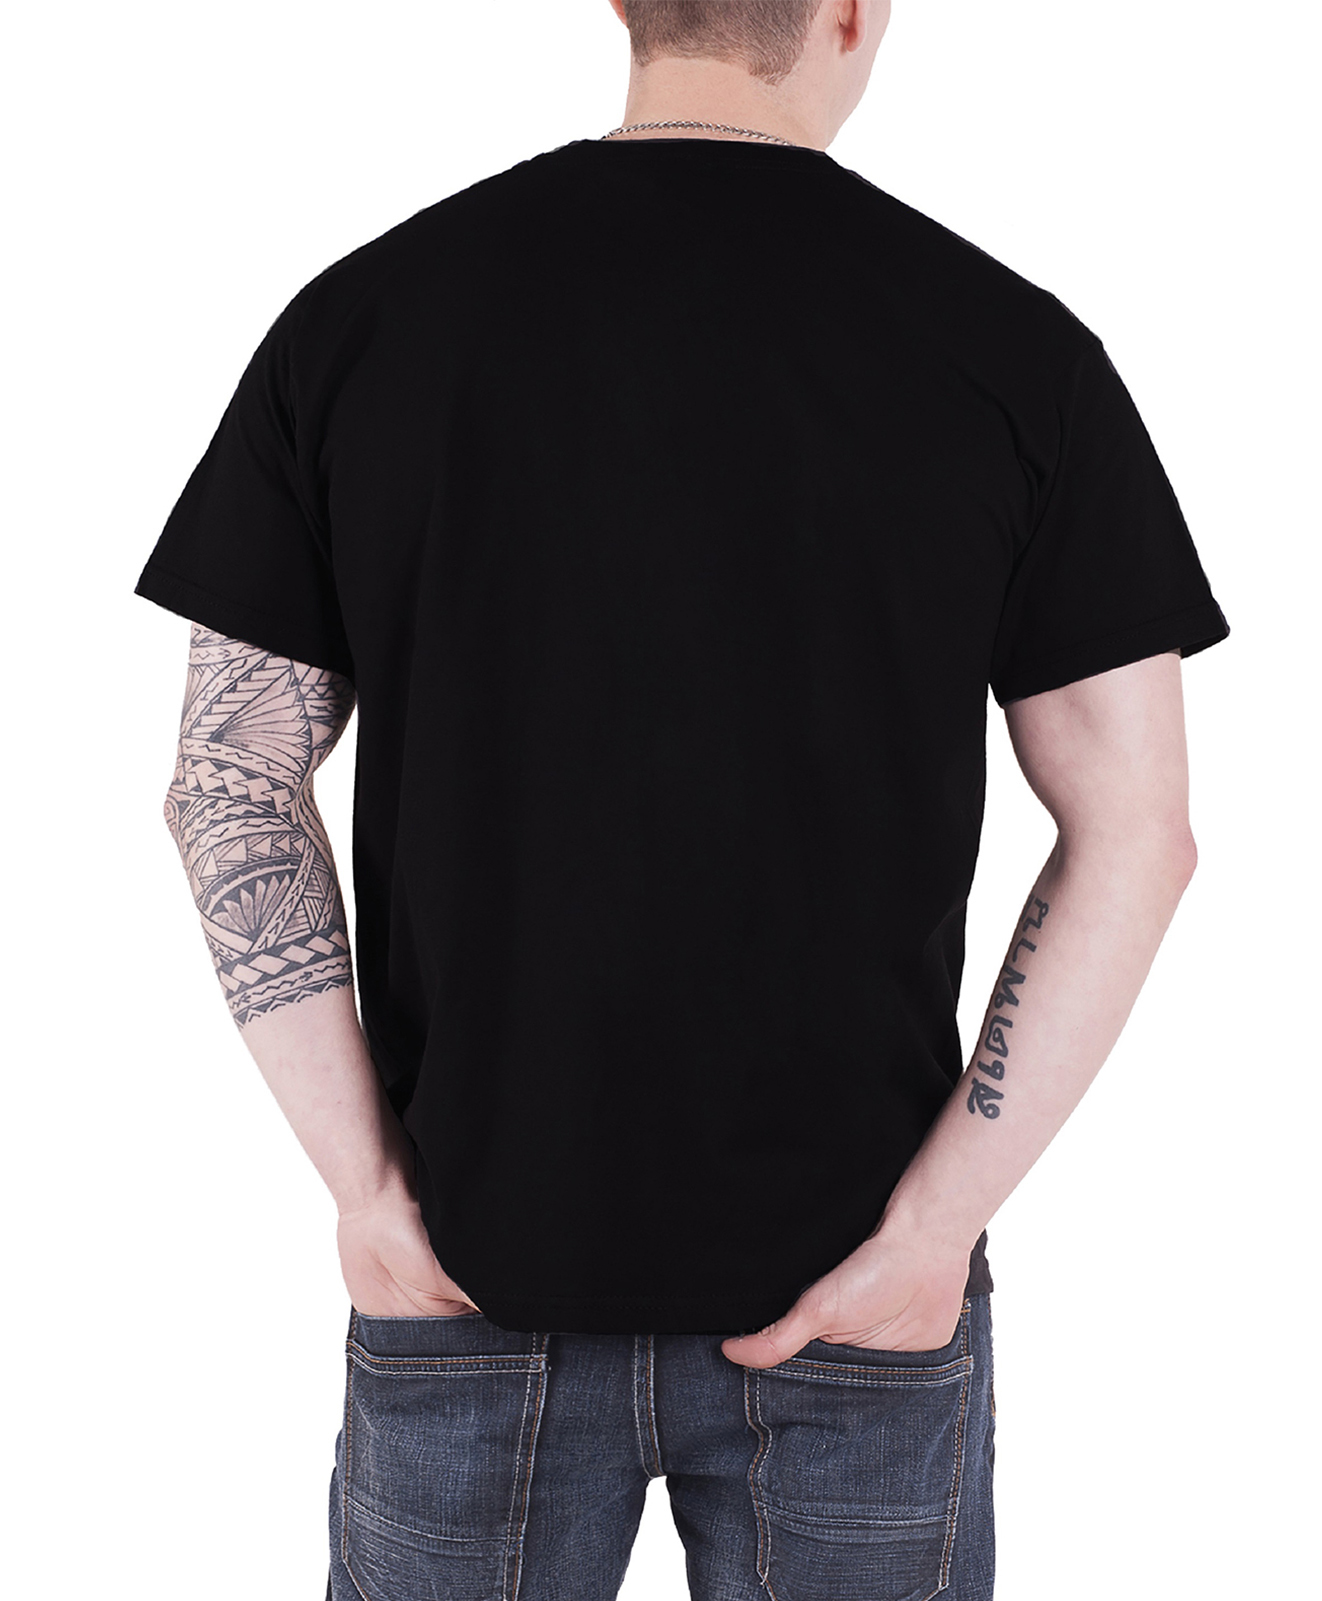 Official-Gas-Monkey-Garage-T-Shirt-Official-GMG-Logo-Kustom-Builds-new-Mens Indexbild 3